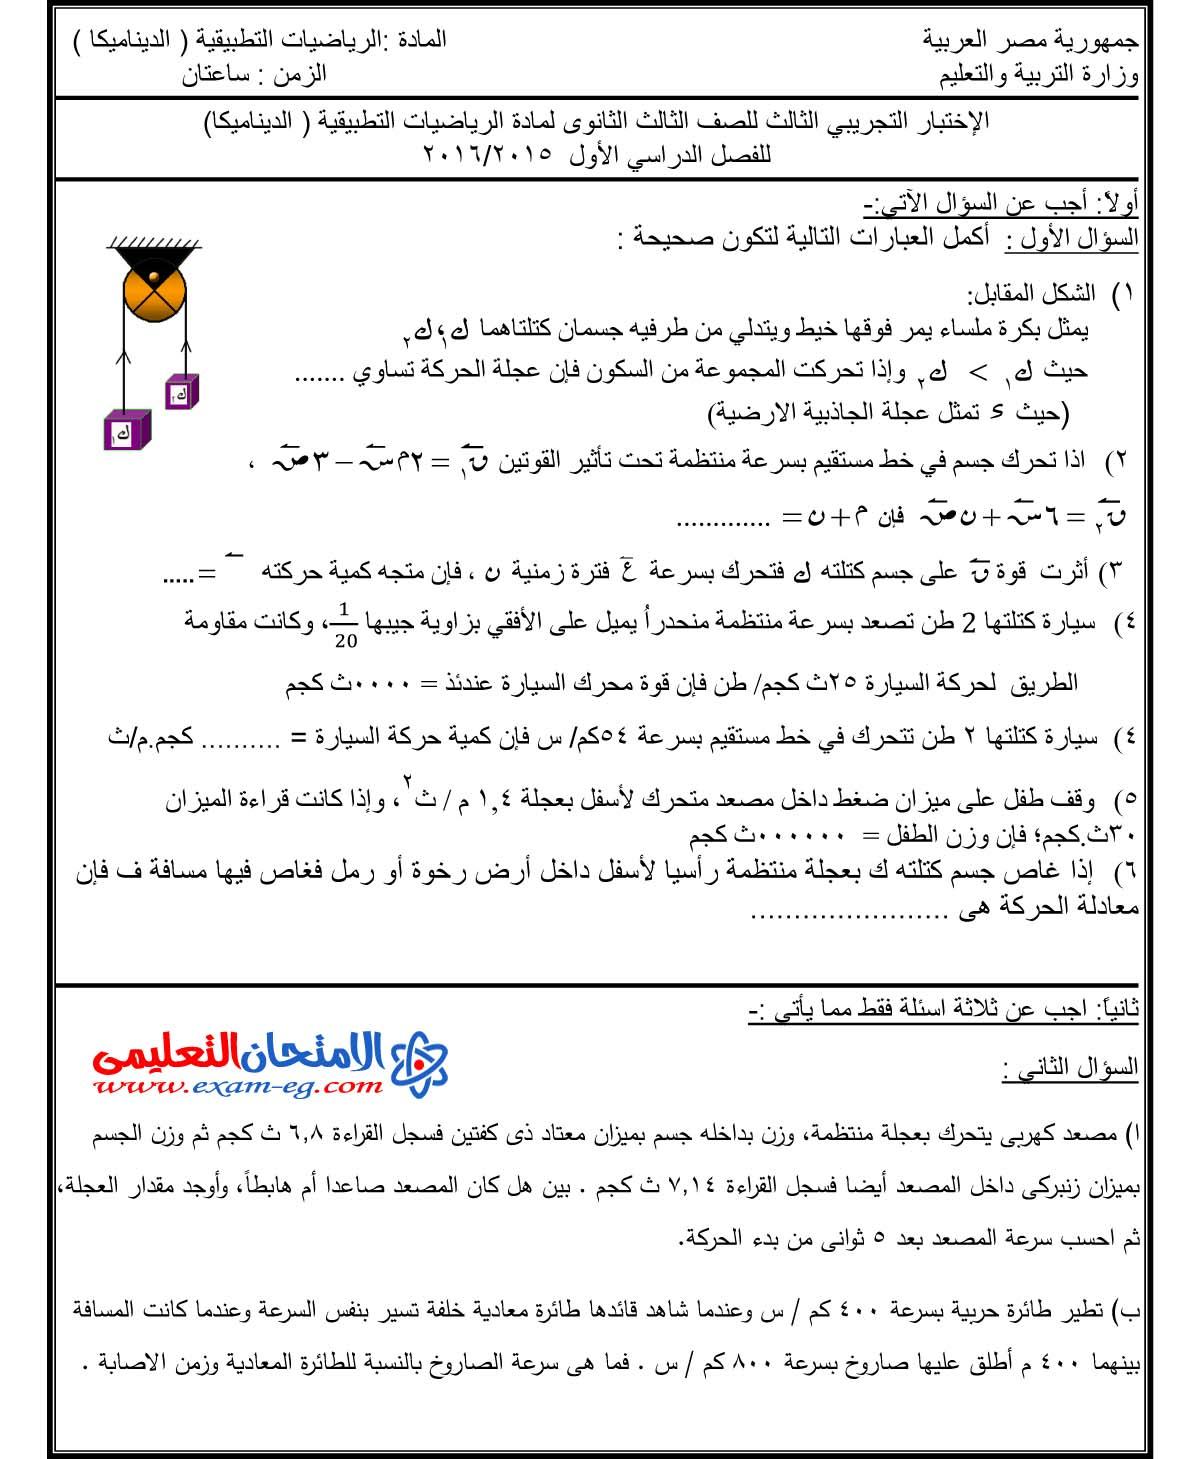 exam-eg.com_1460420681025.jpg